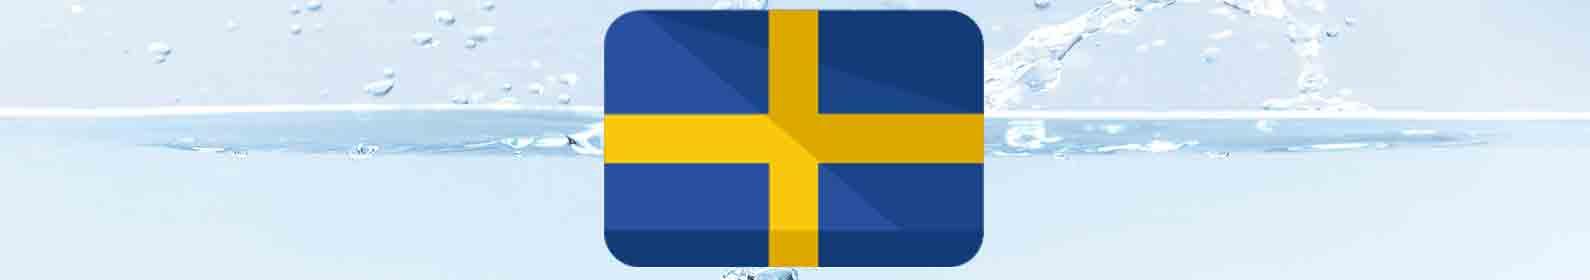 water-treatment-sweden.jpg